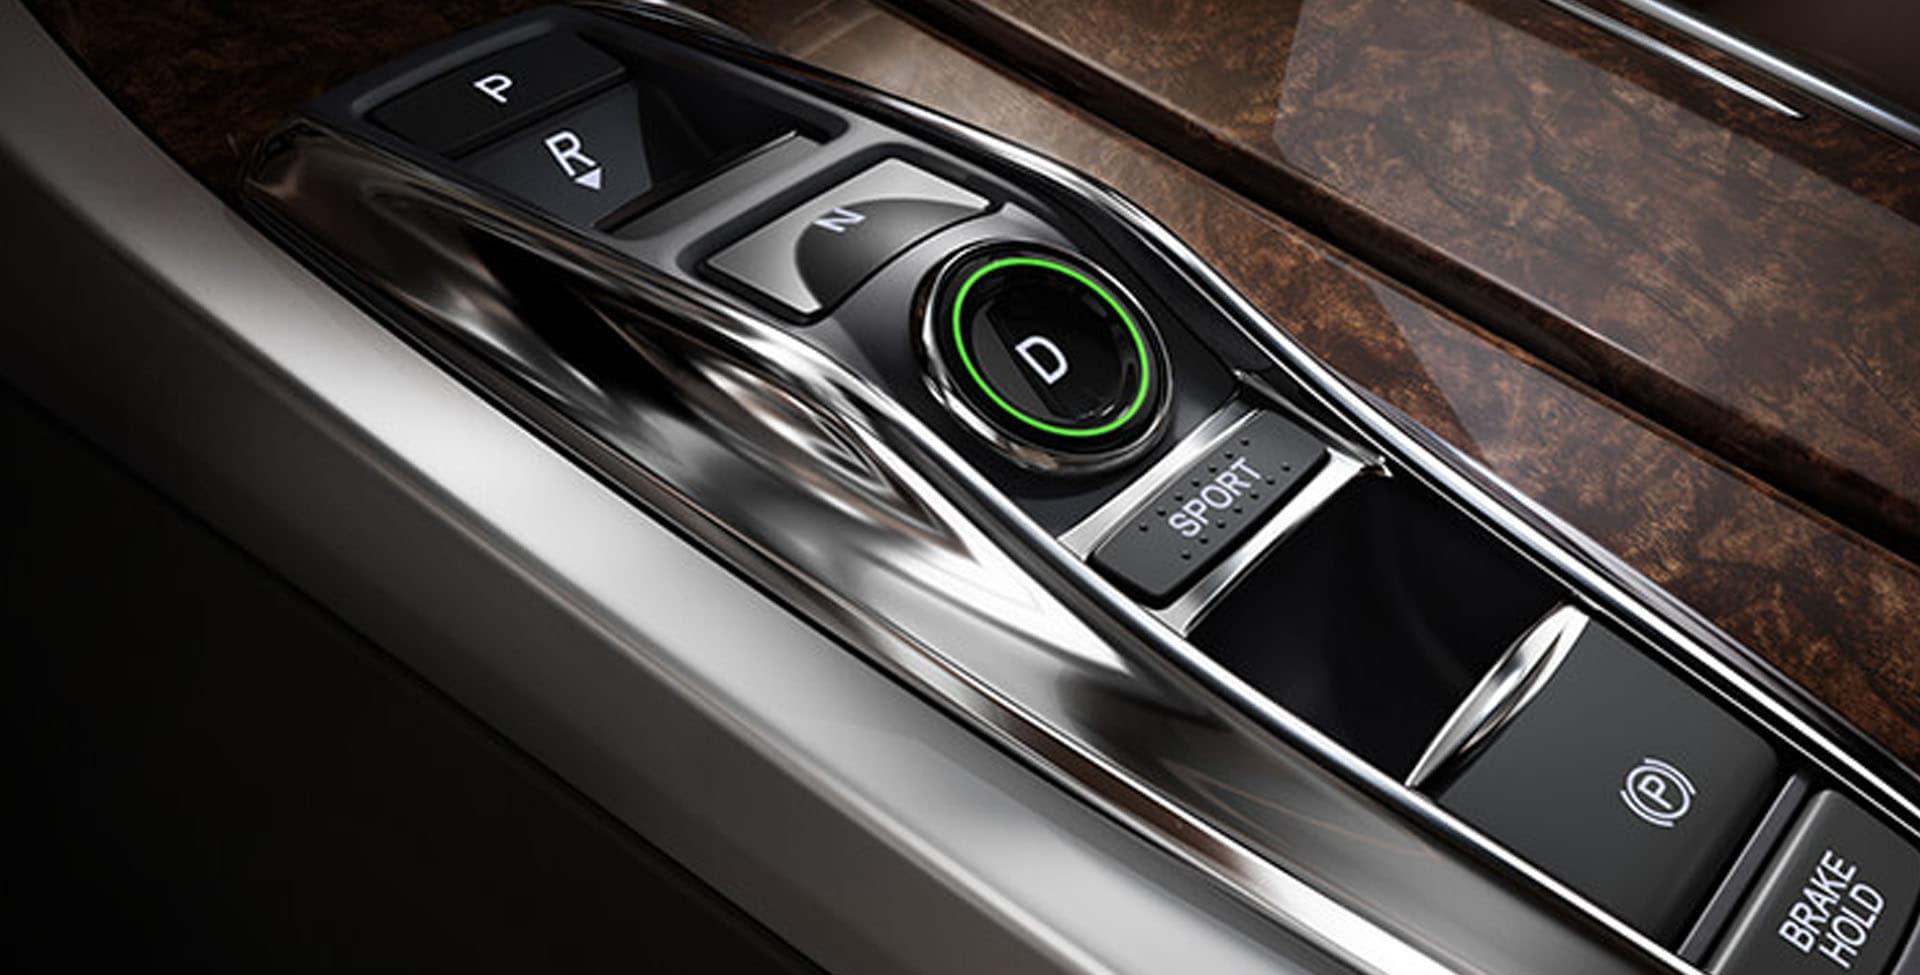 Acura RLX electronic gear selector